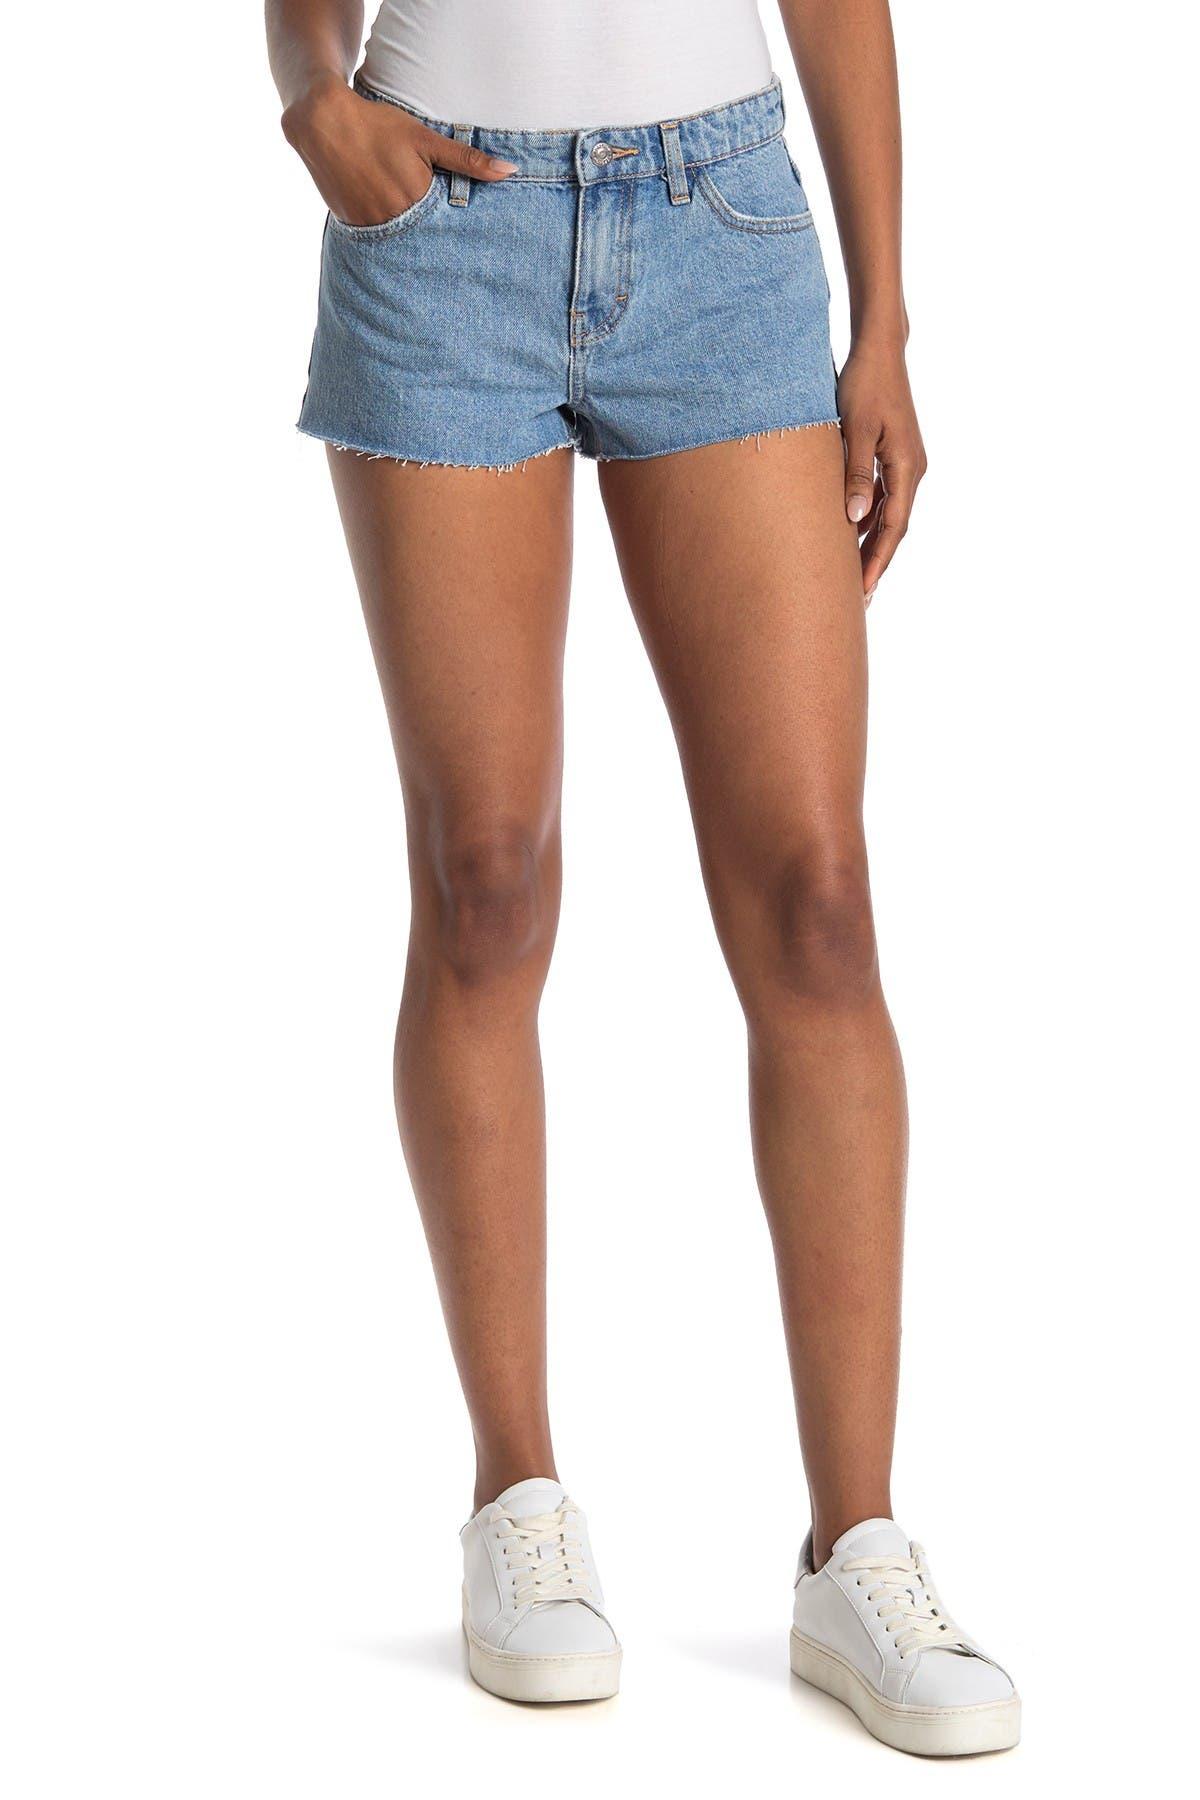 Image of TOPSHOP Tilly Raw Hem Denim Shorts